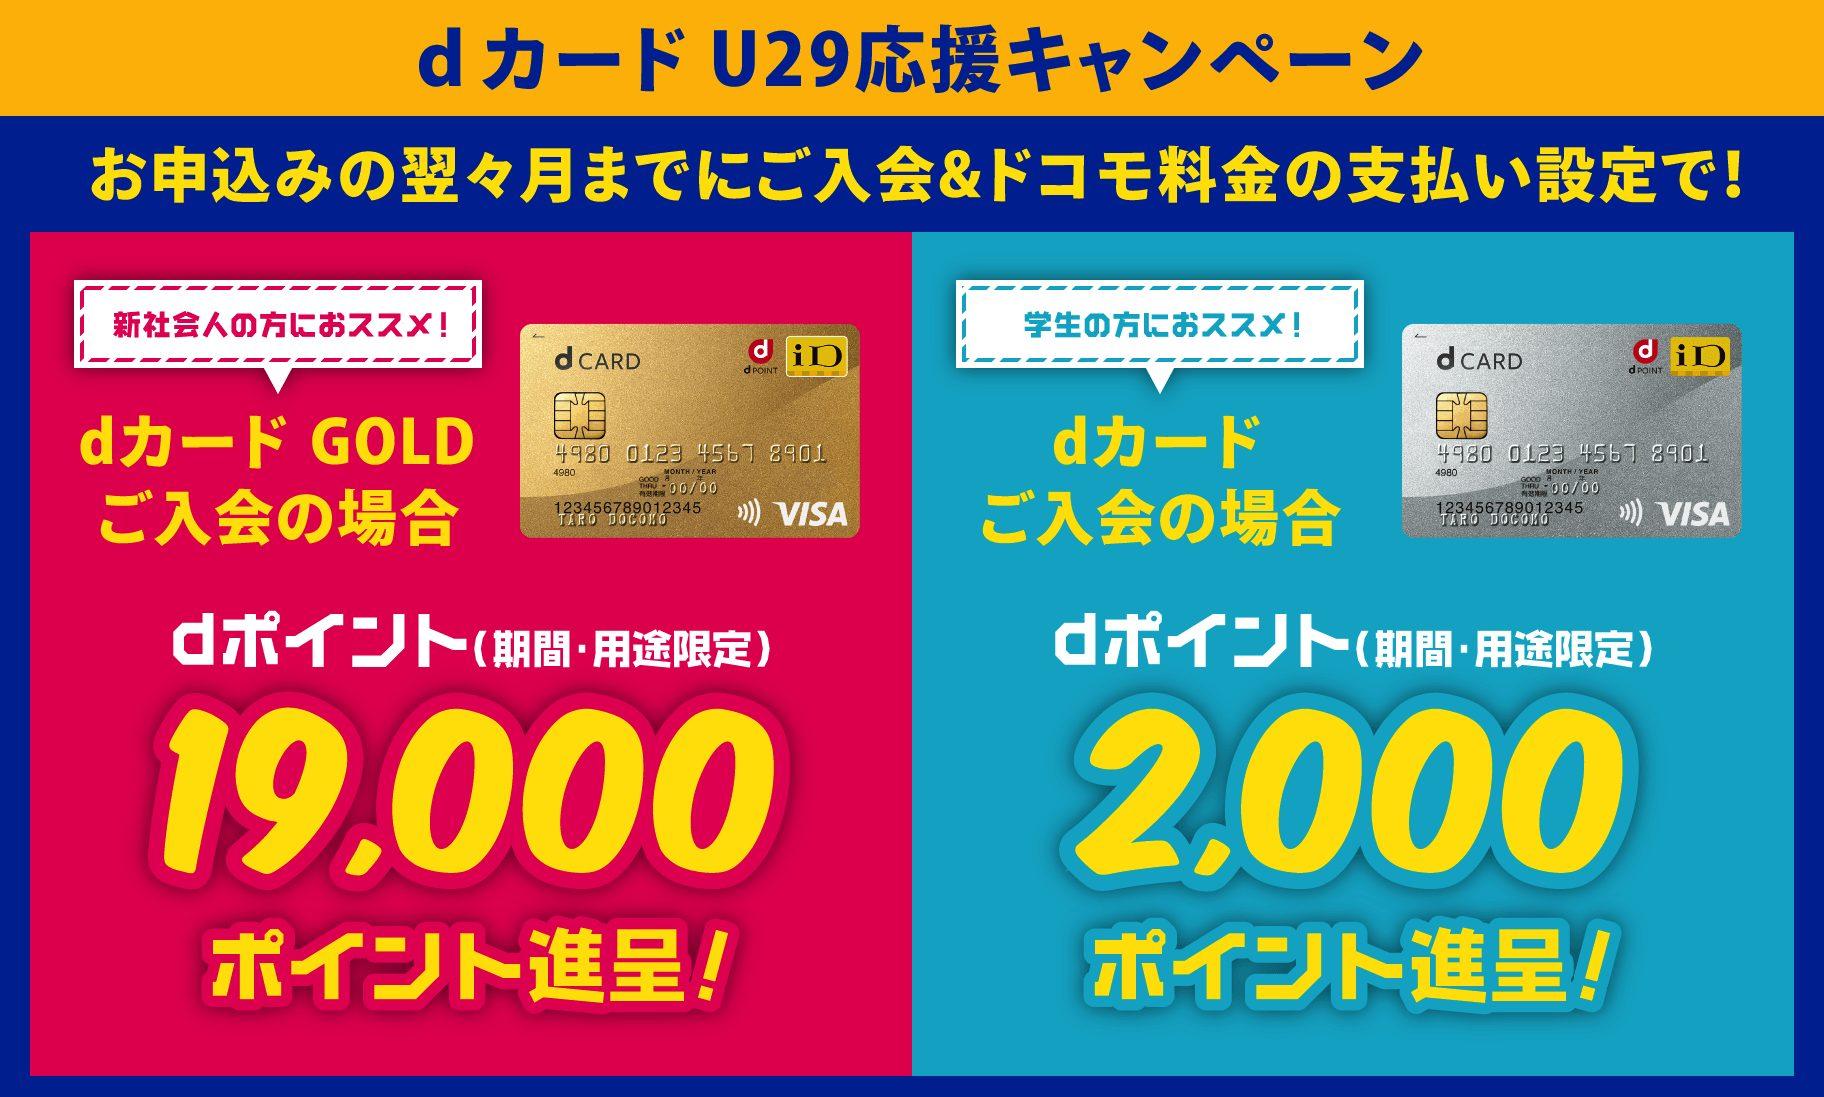 dカードU29応援キャンペーン詳細